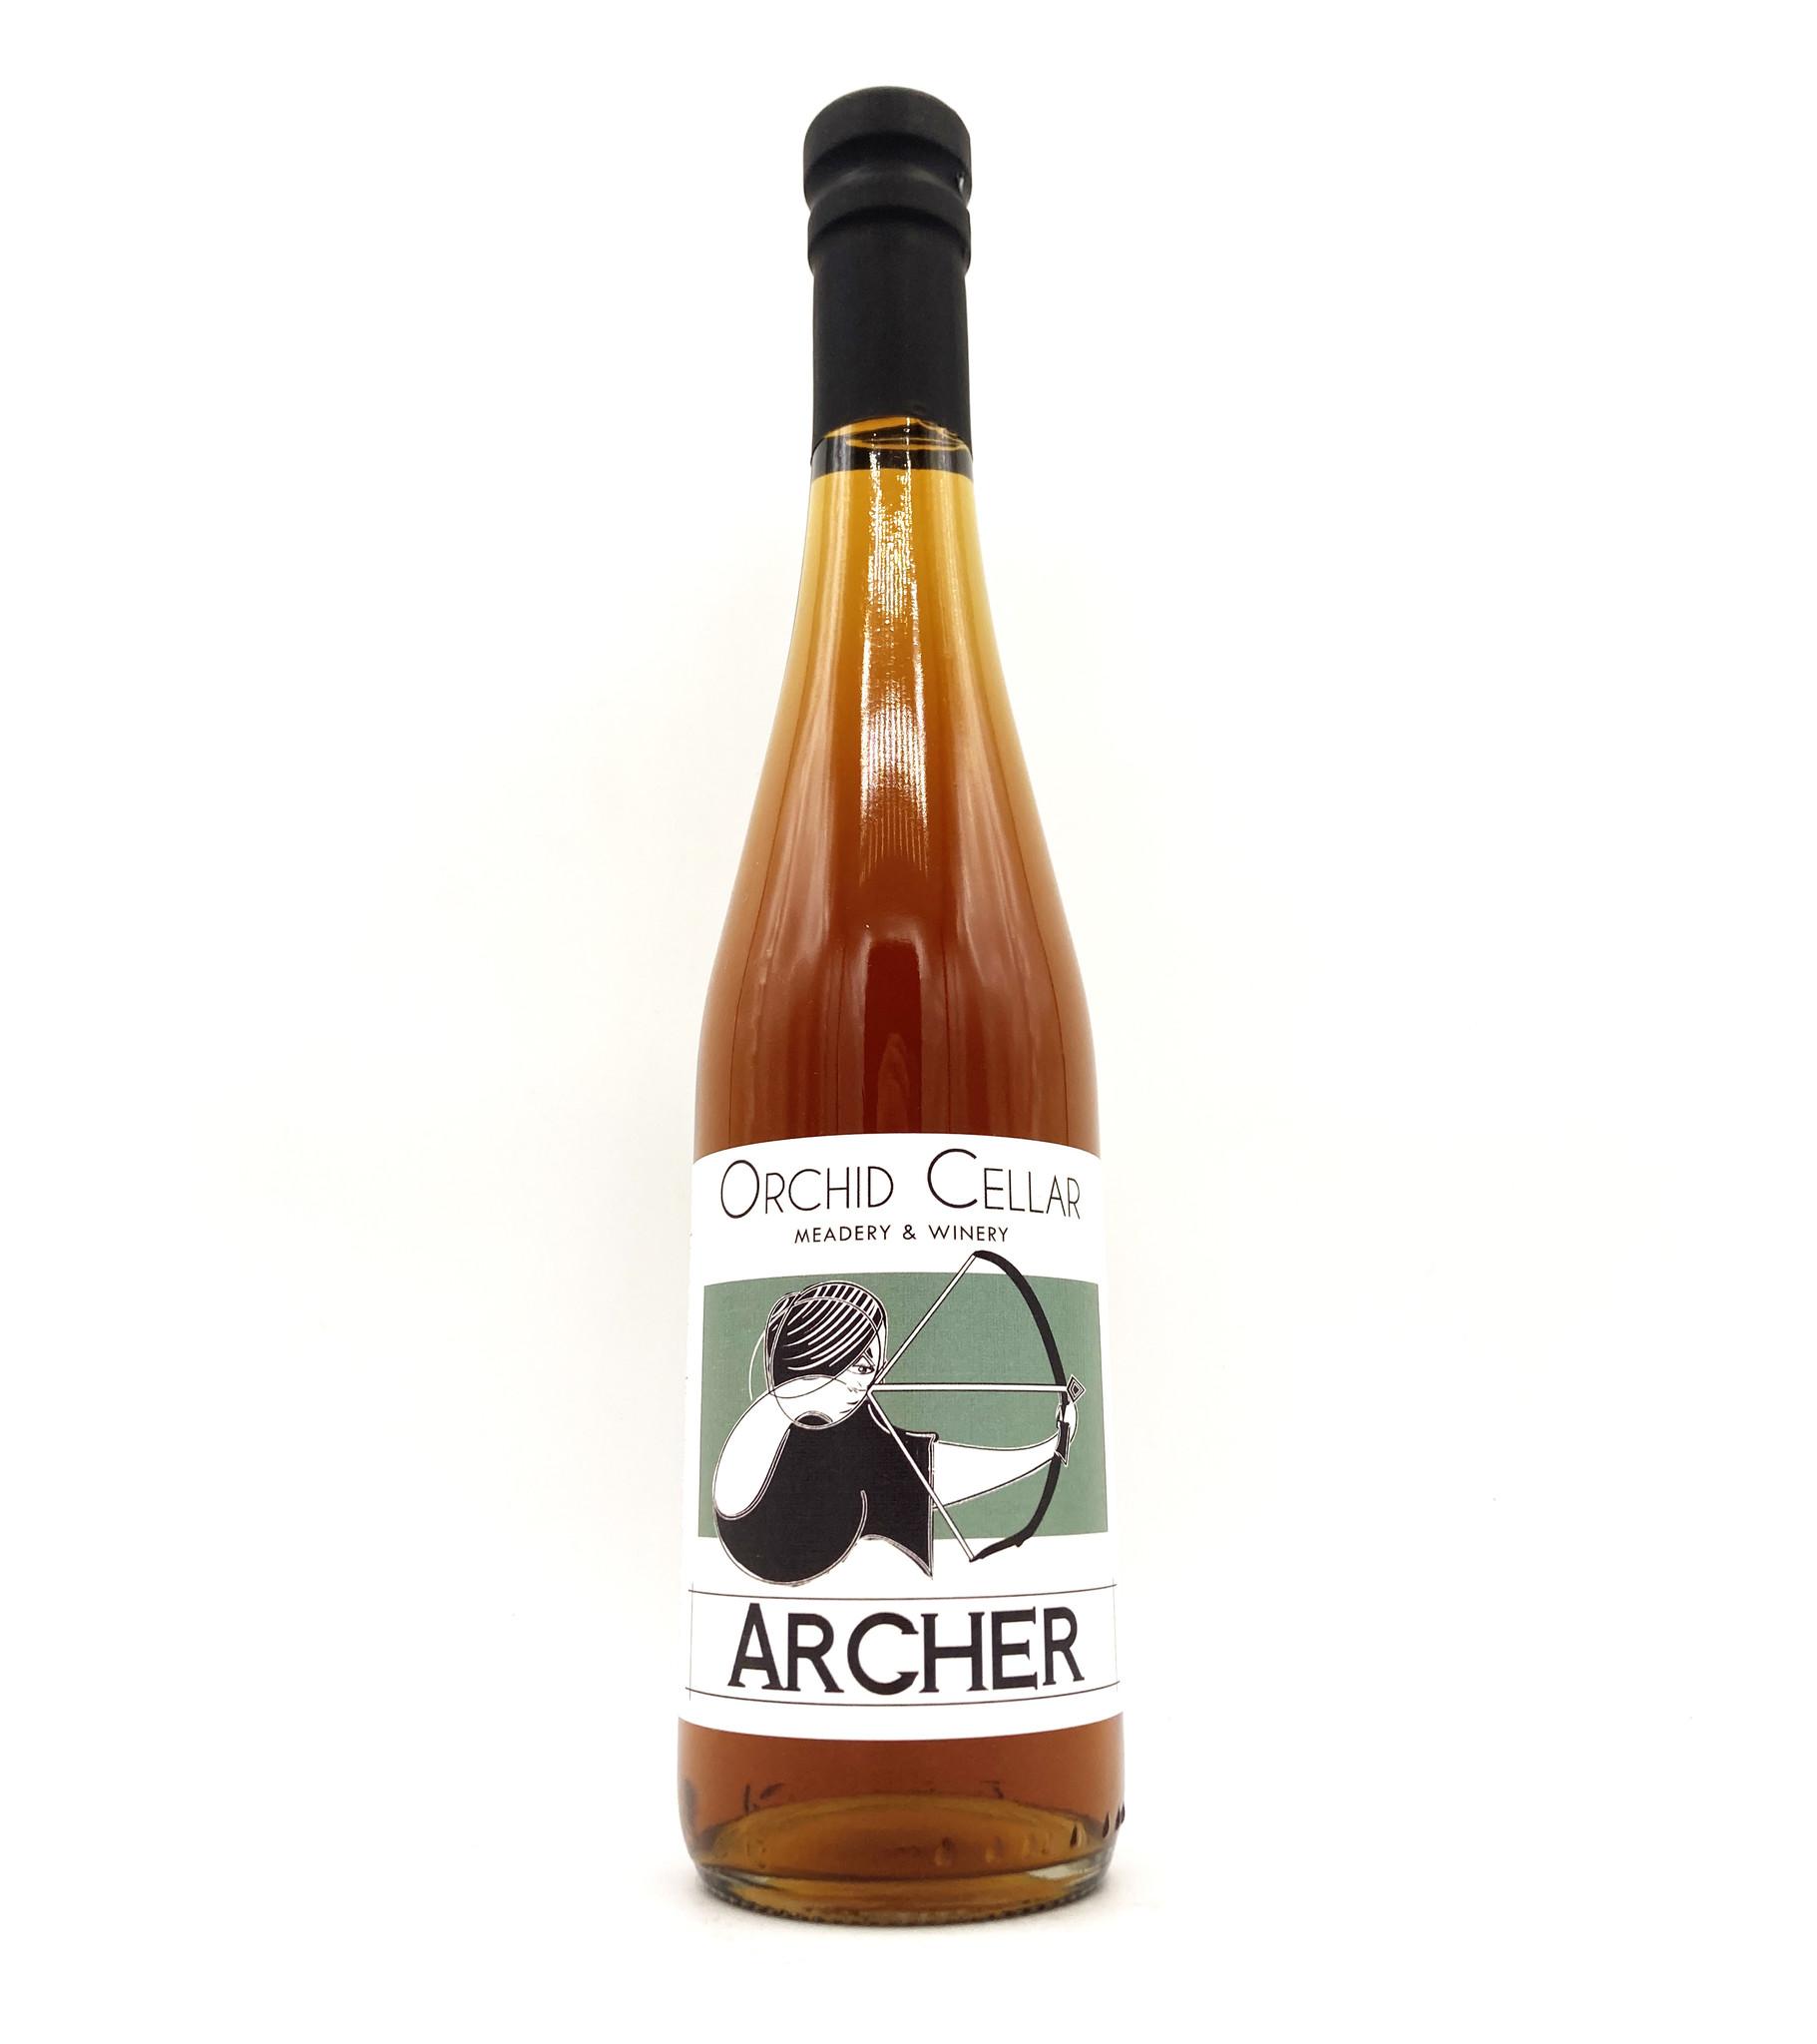 Archer Mead 375ml Orchid Cellar